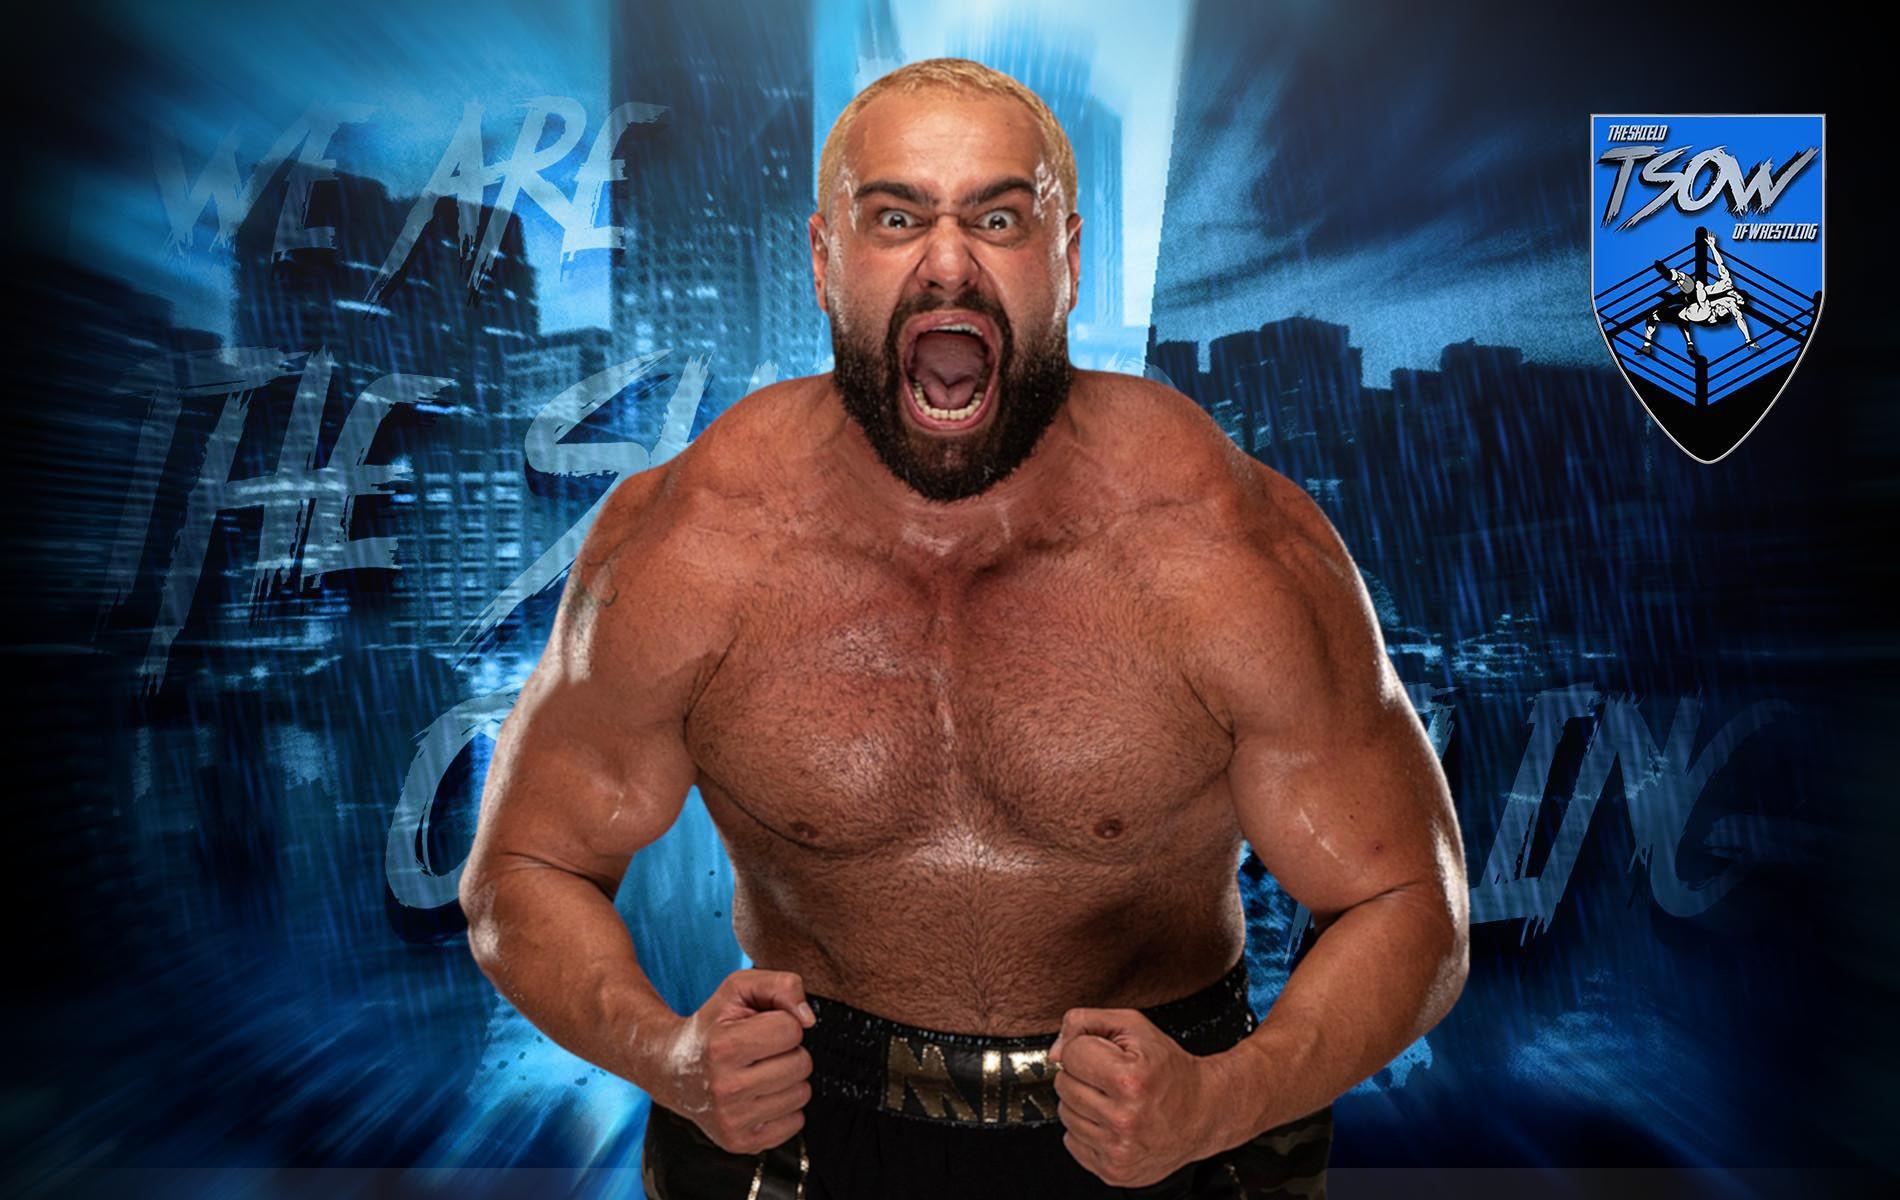 Miro racconta la sua esperienza in WWE